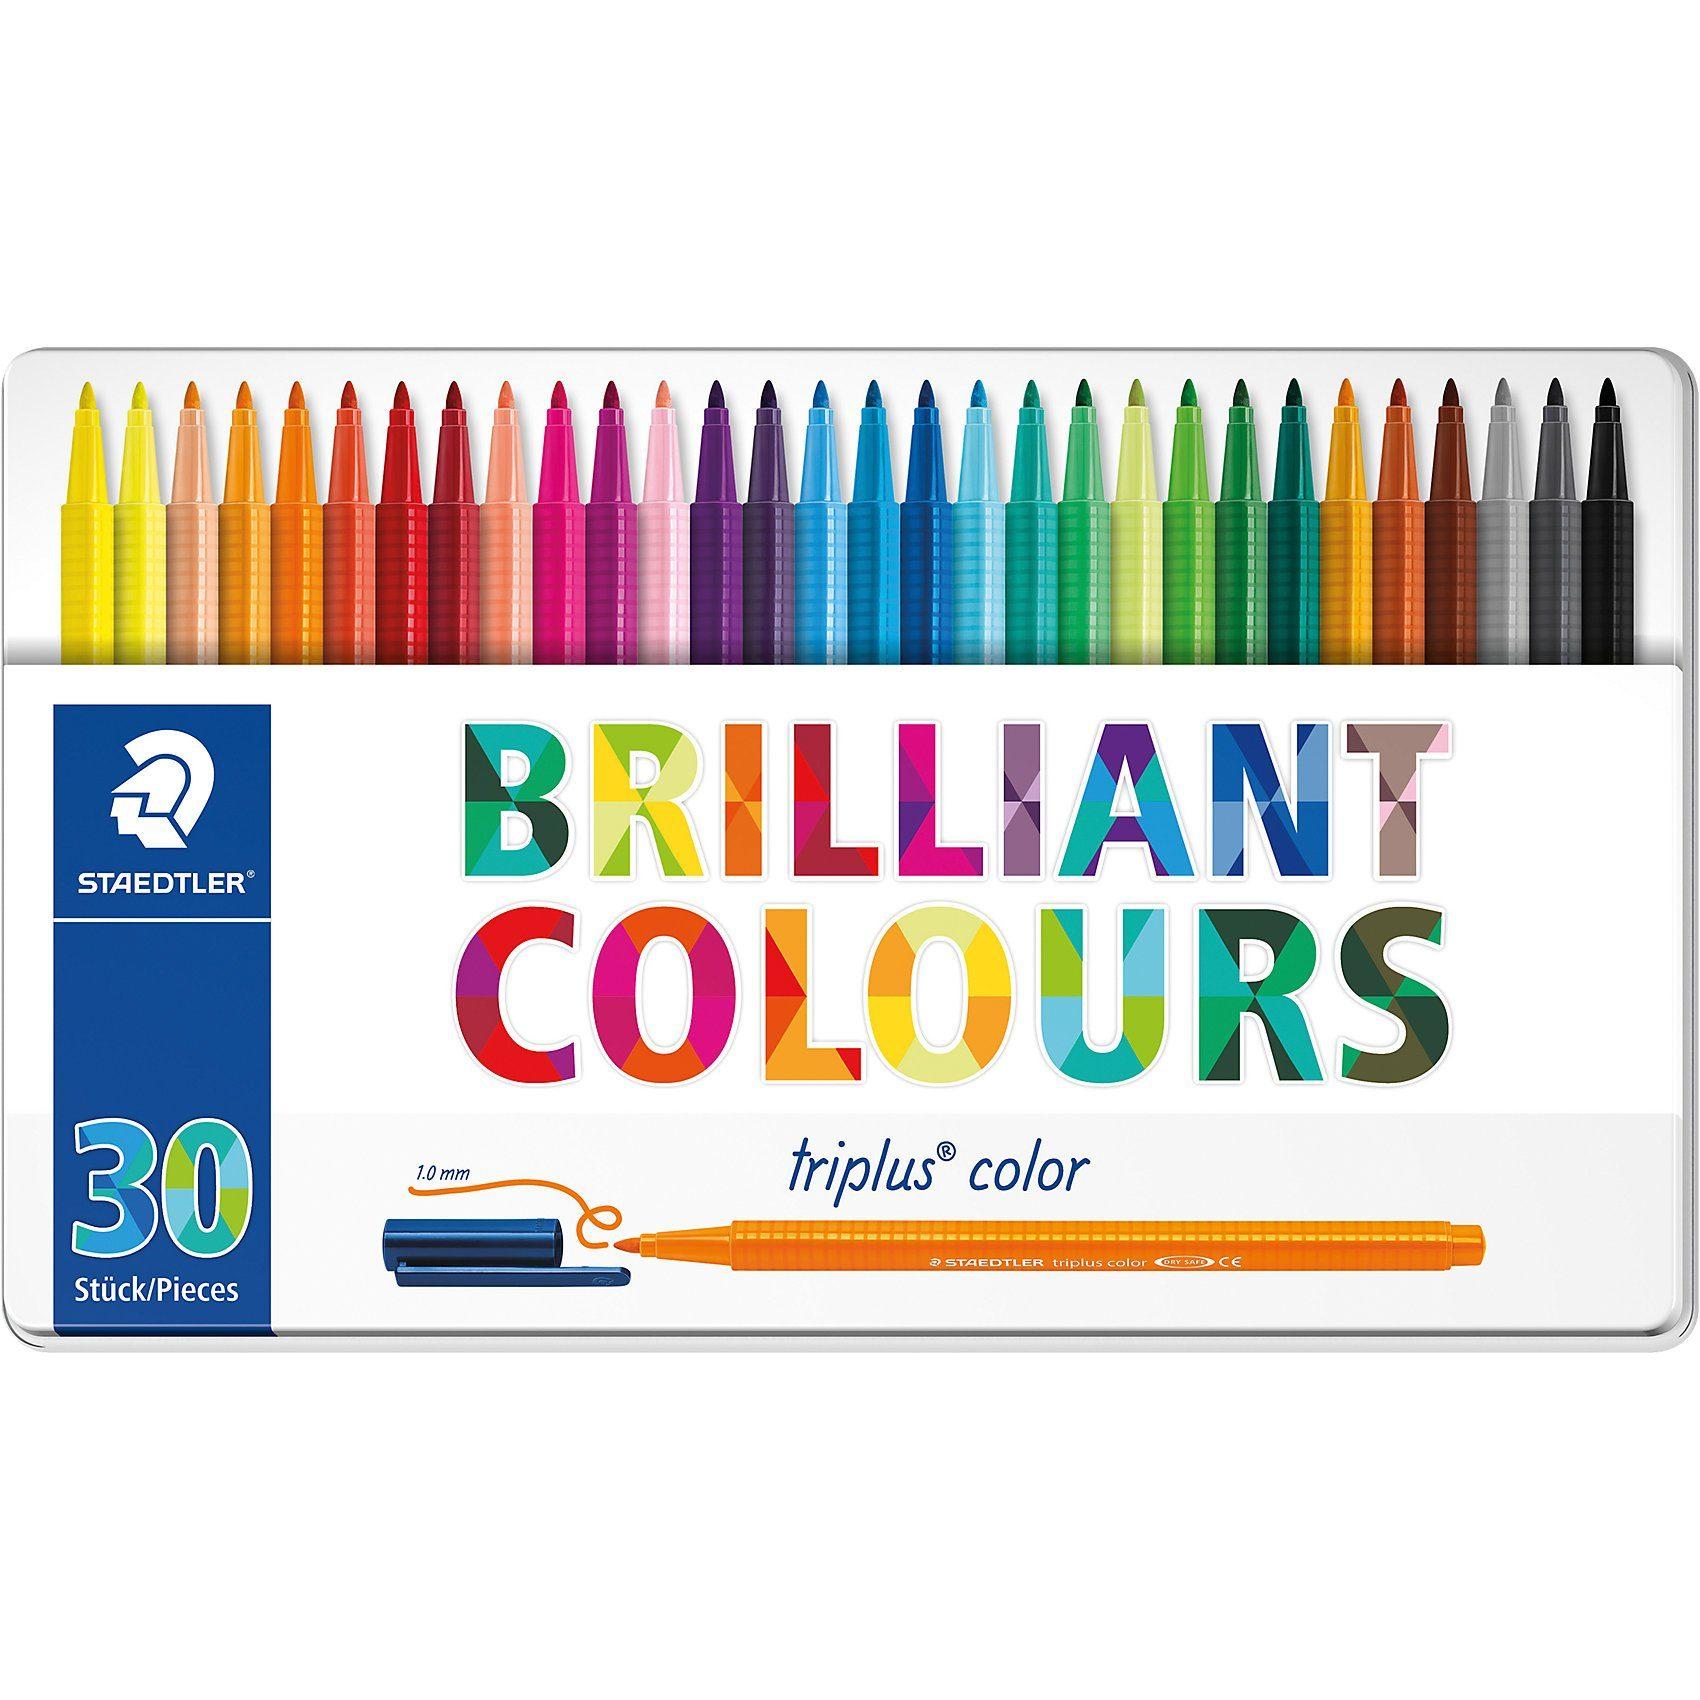 STAEDTLER Filzstifte triplus color, 30 Farben